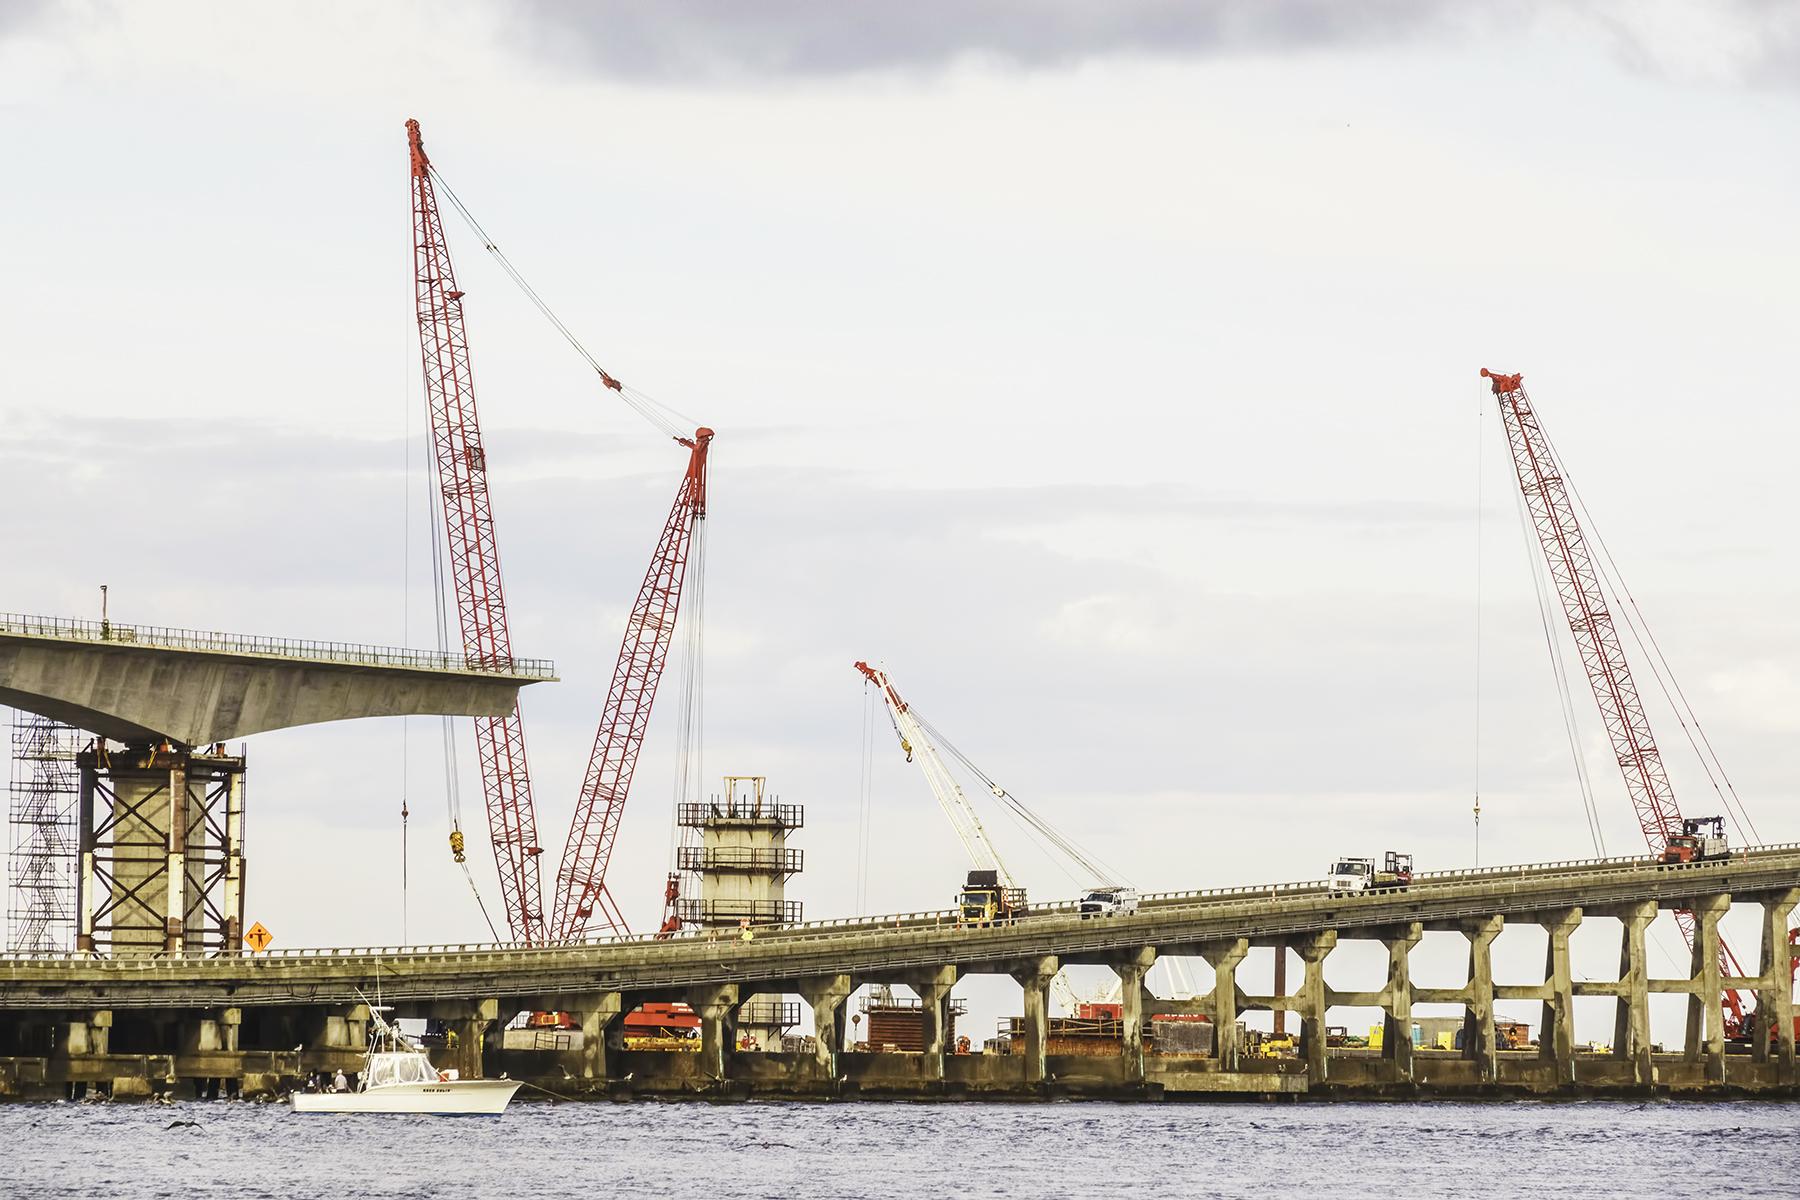 Bonner Bridge replacement at Oregon Inlet, Outer Banks